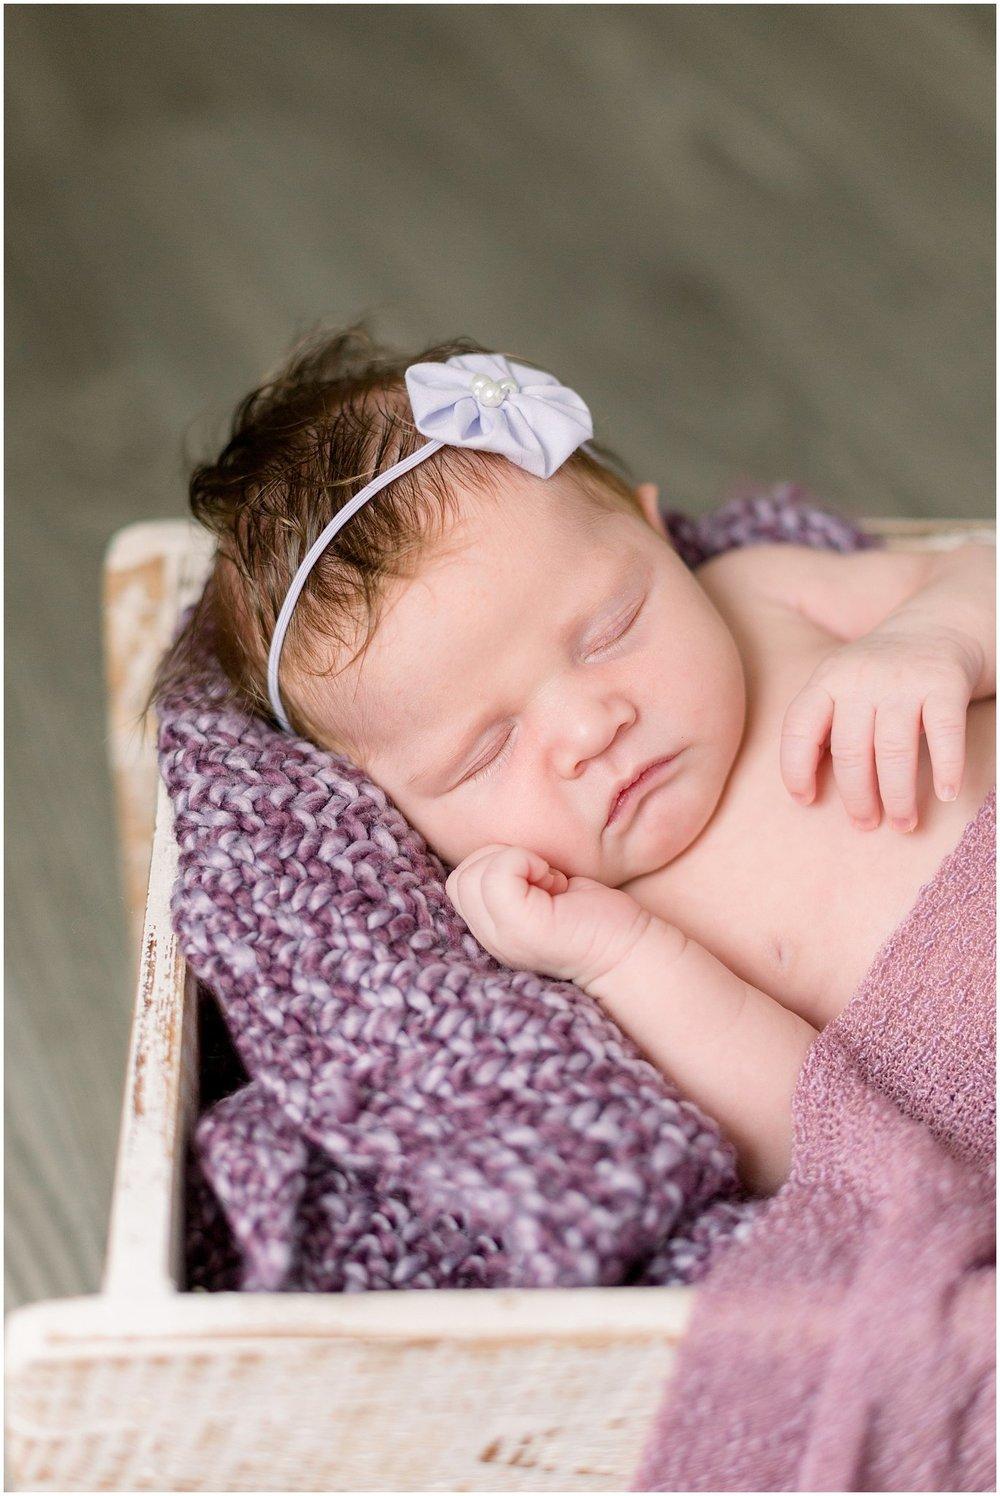 Winter-Garden-Maternity-Newborn-Photographer_0036.jpg